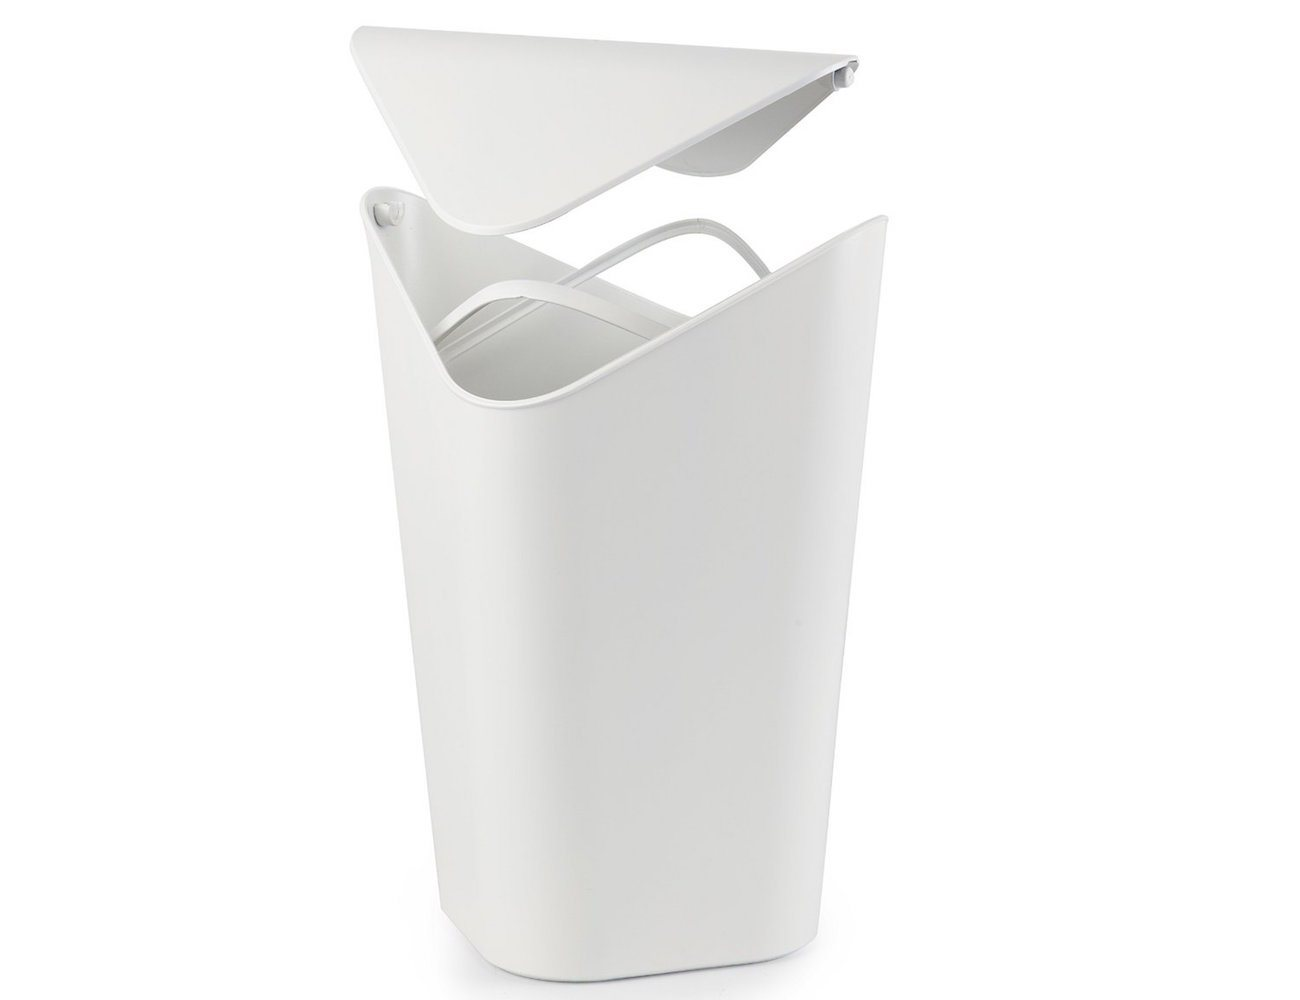 Corner Waste Bin – Perfect Waste Bin for Corners